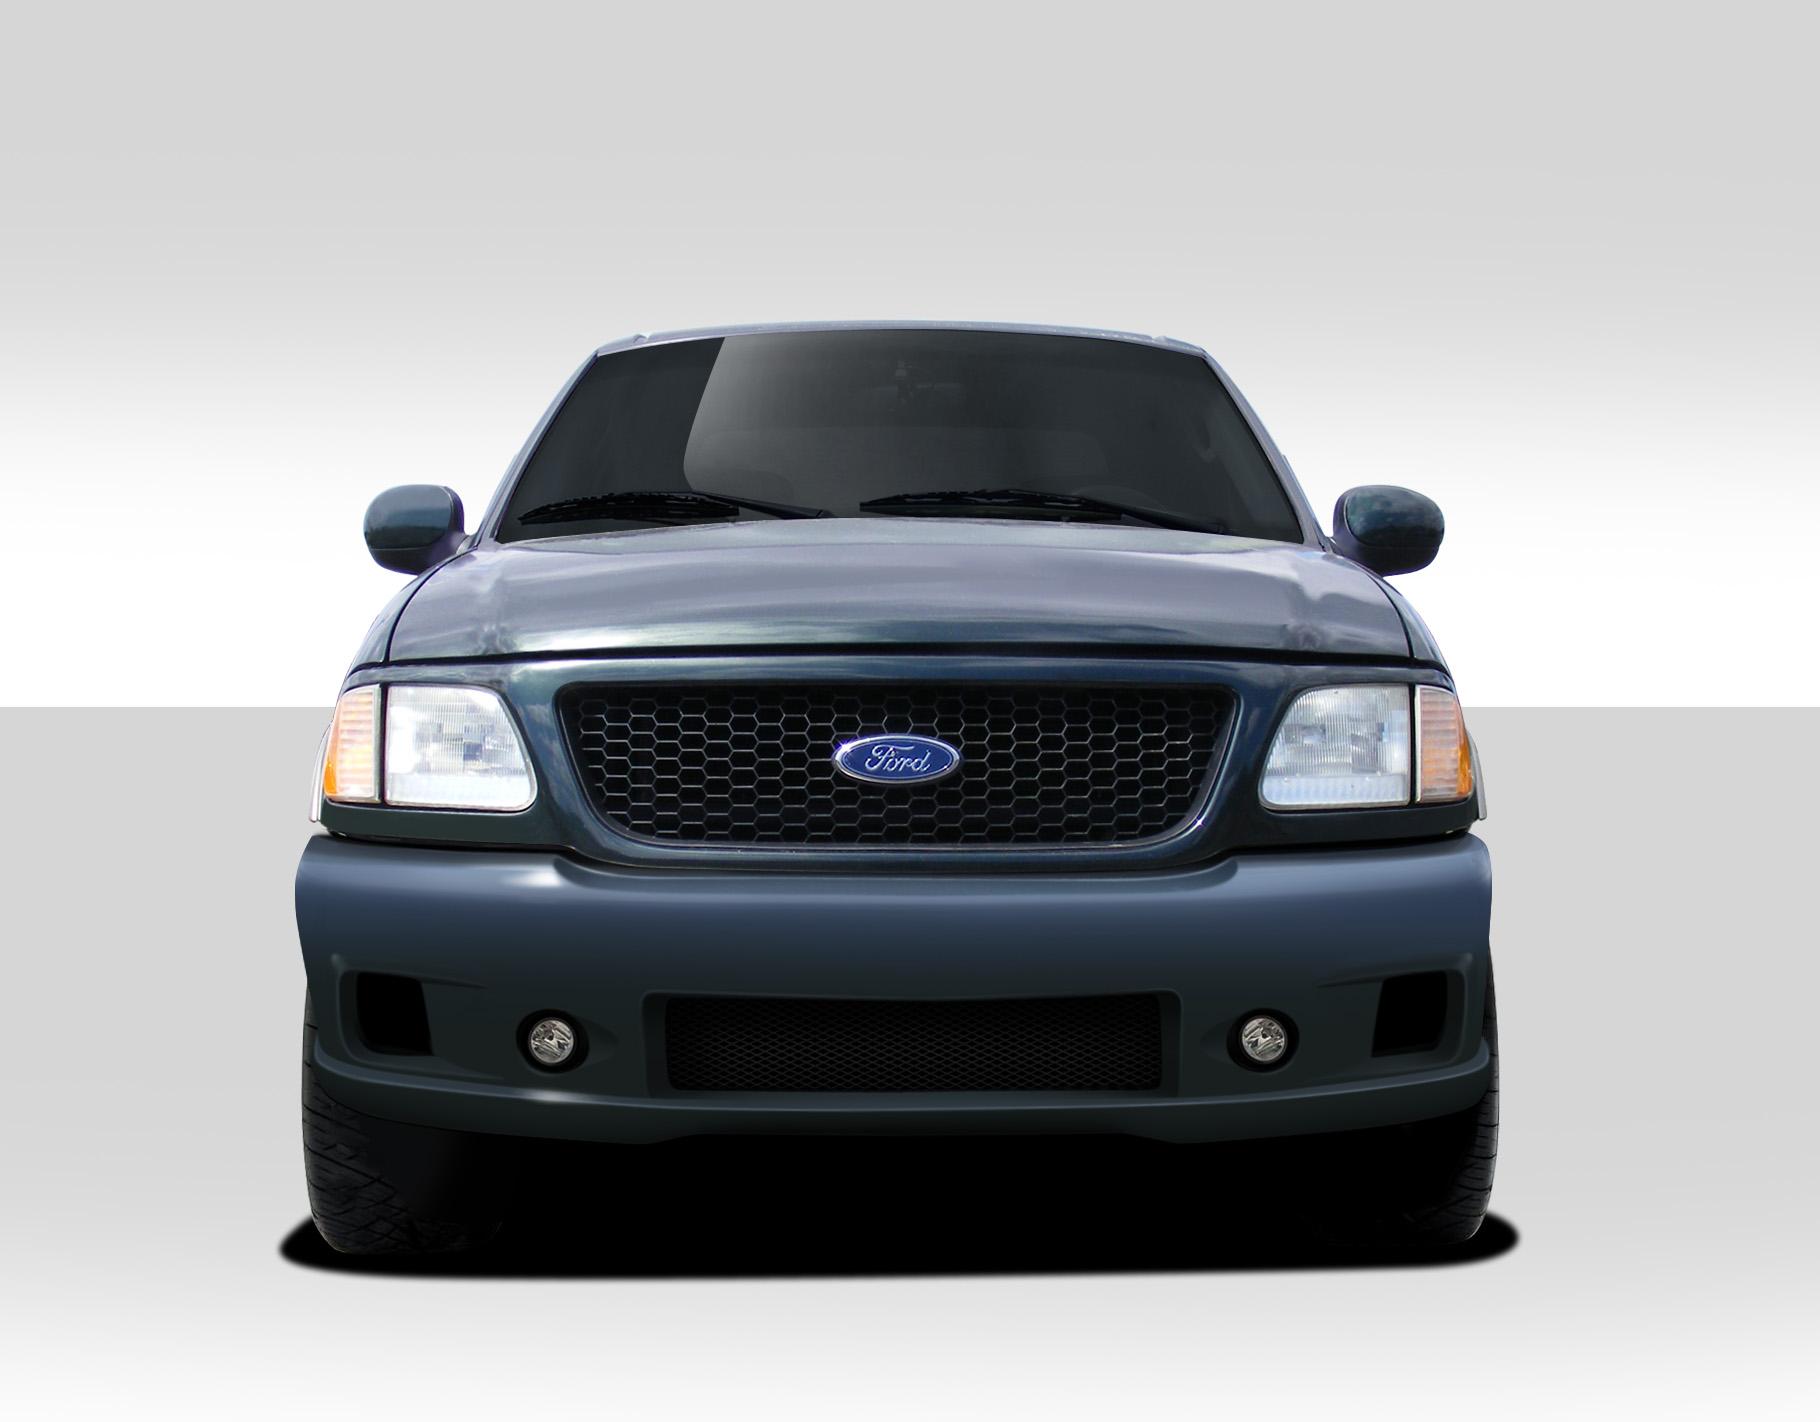 97 03 Ford F150 Bt 2 Duraflex Front Body Kit Bumper